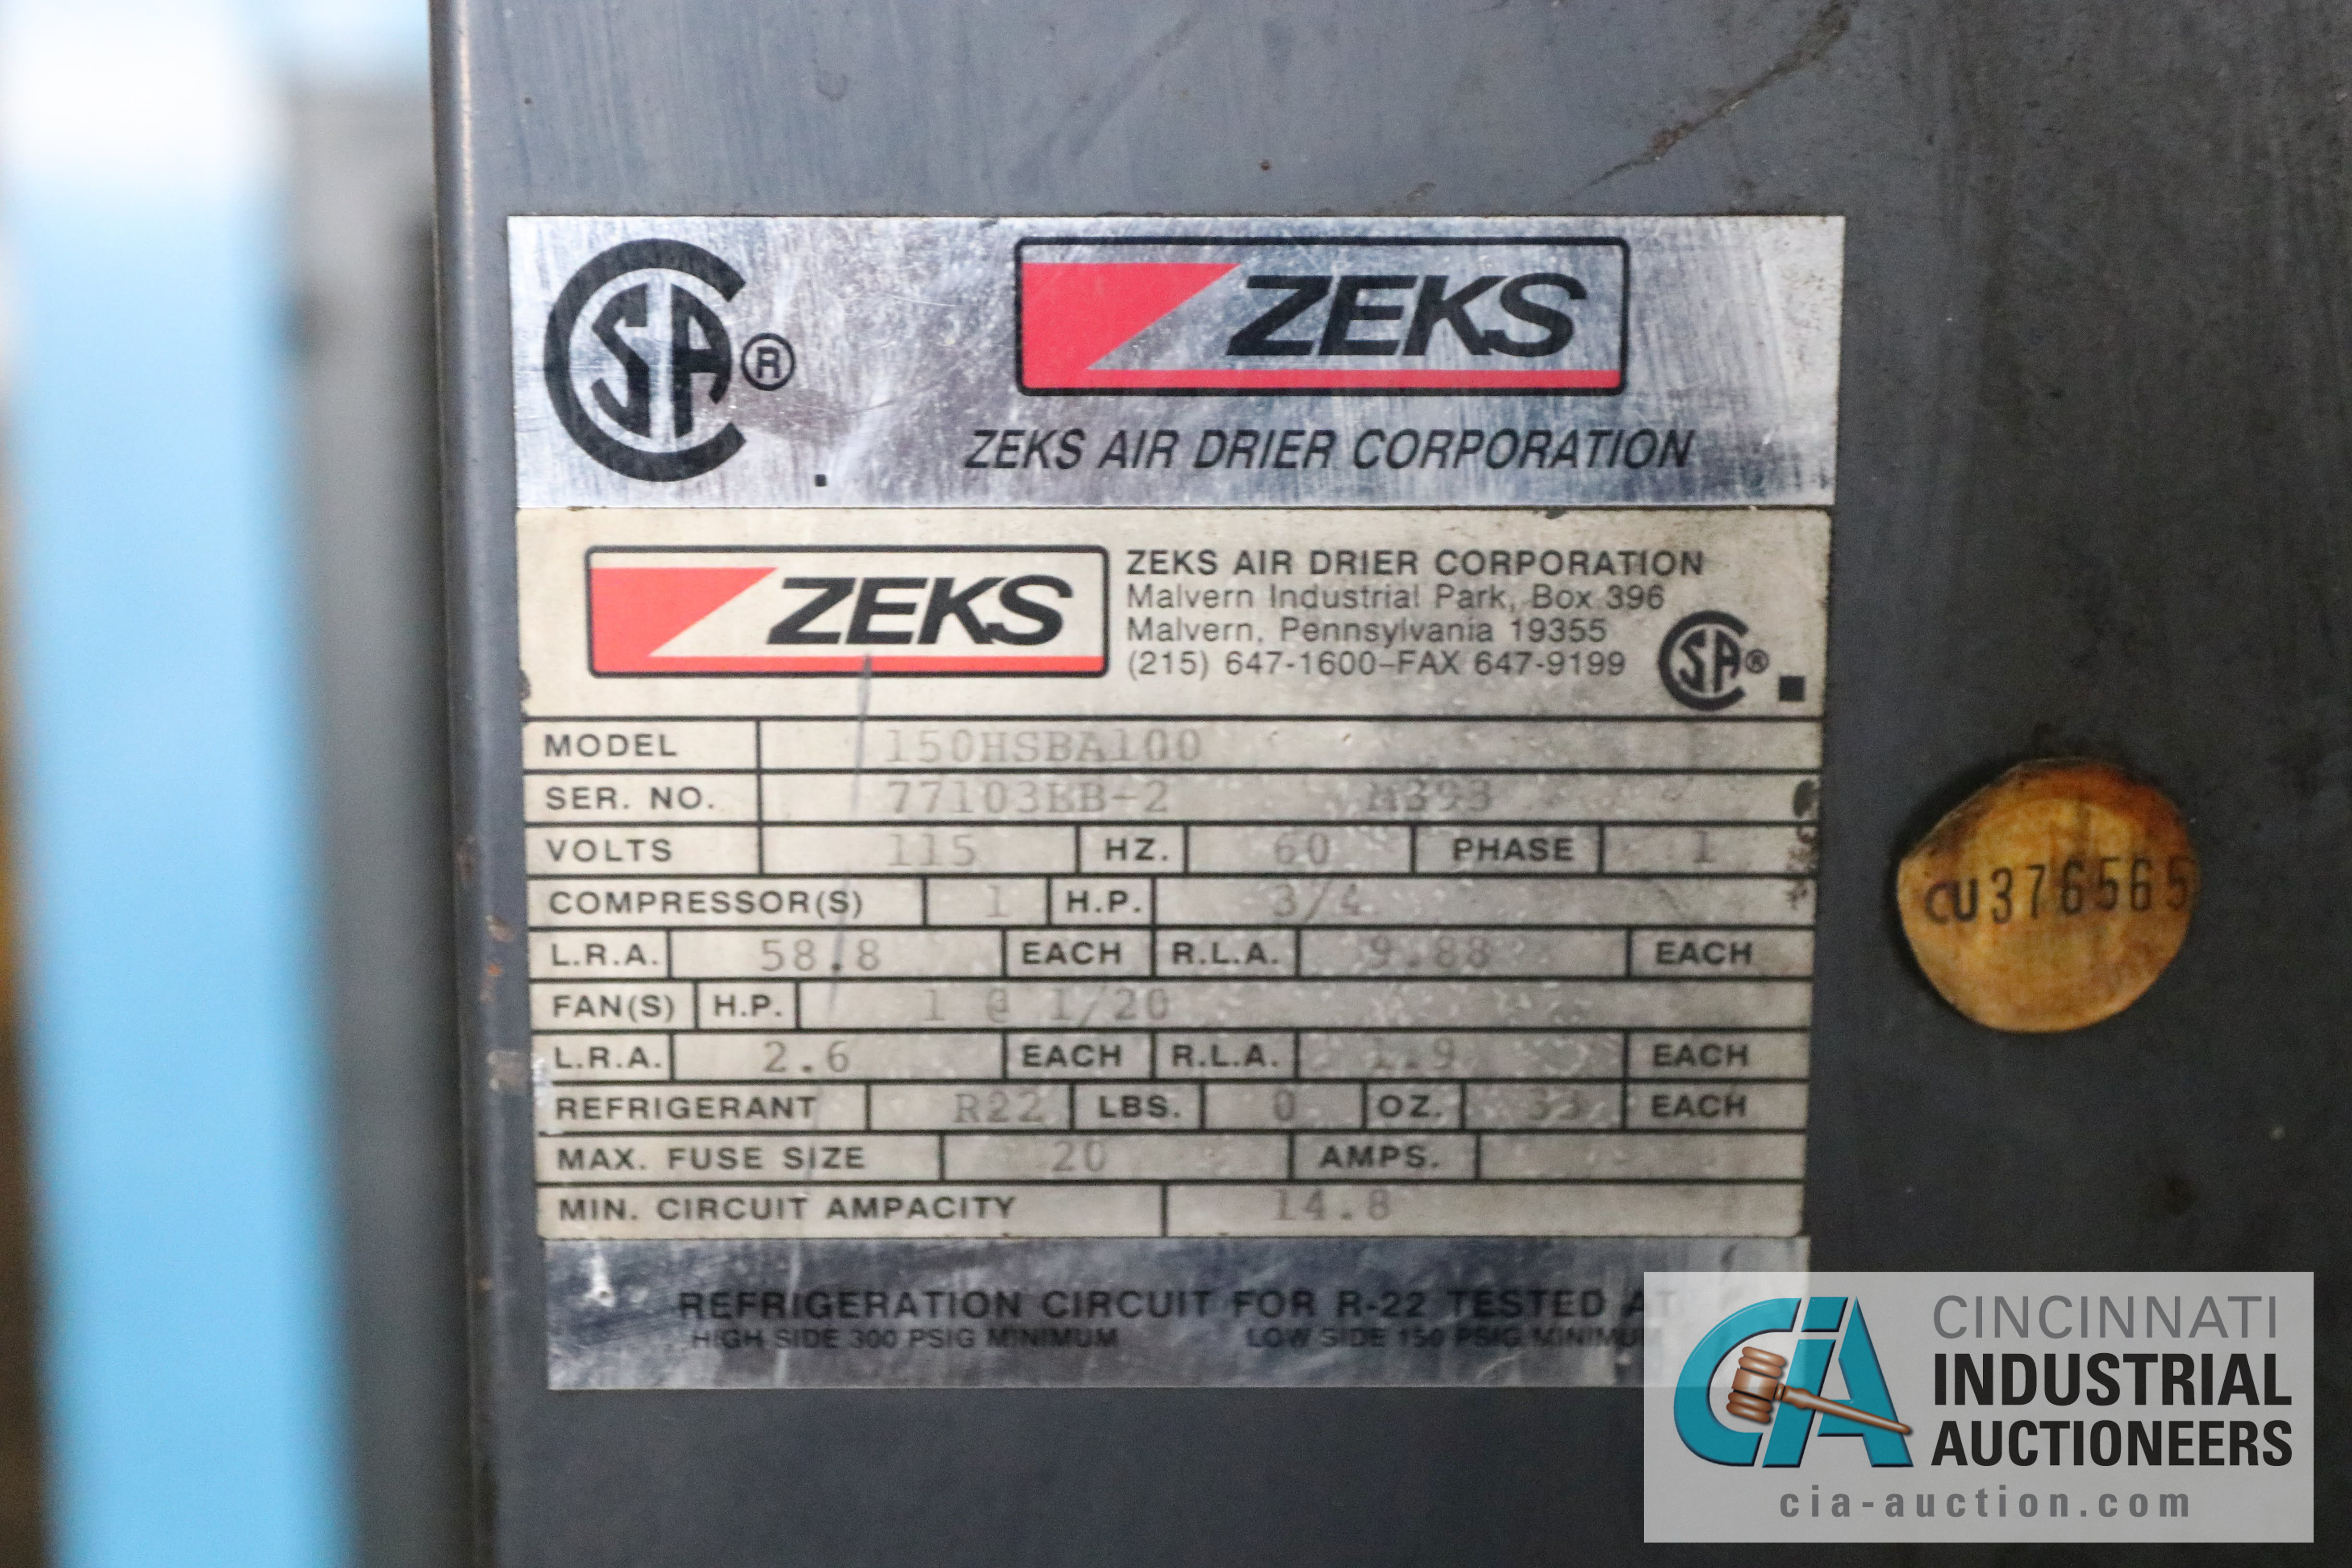 ZEKS MODEL 150HSBA100 AIR DRYER; S/N 77103KB-2 - $100.00 Rigging Fee Due to Onsite Rigger - - Image 2 of 3